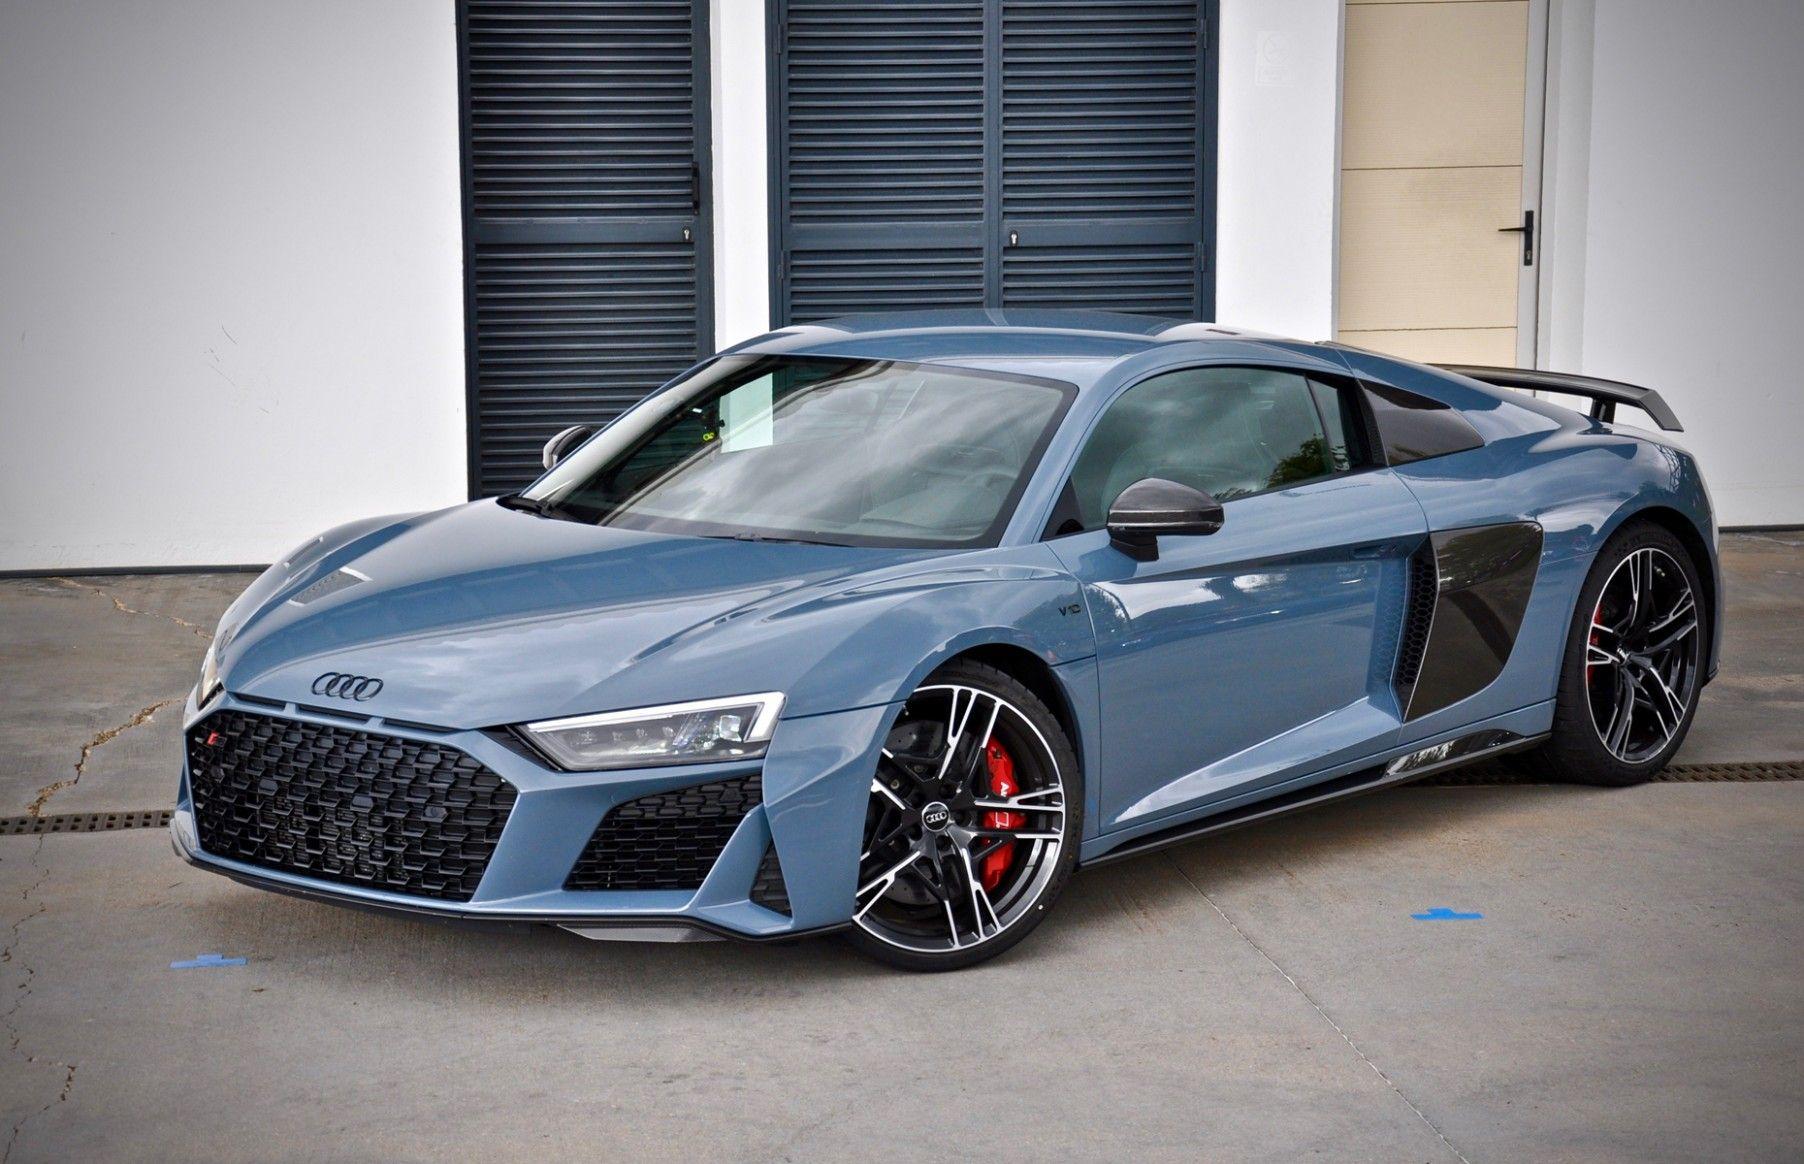 2021 Audi R8 V10 Spyder Review Audi R8 Interior Audi Sports Car Audi R8